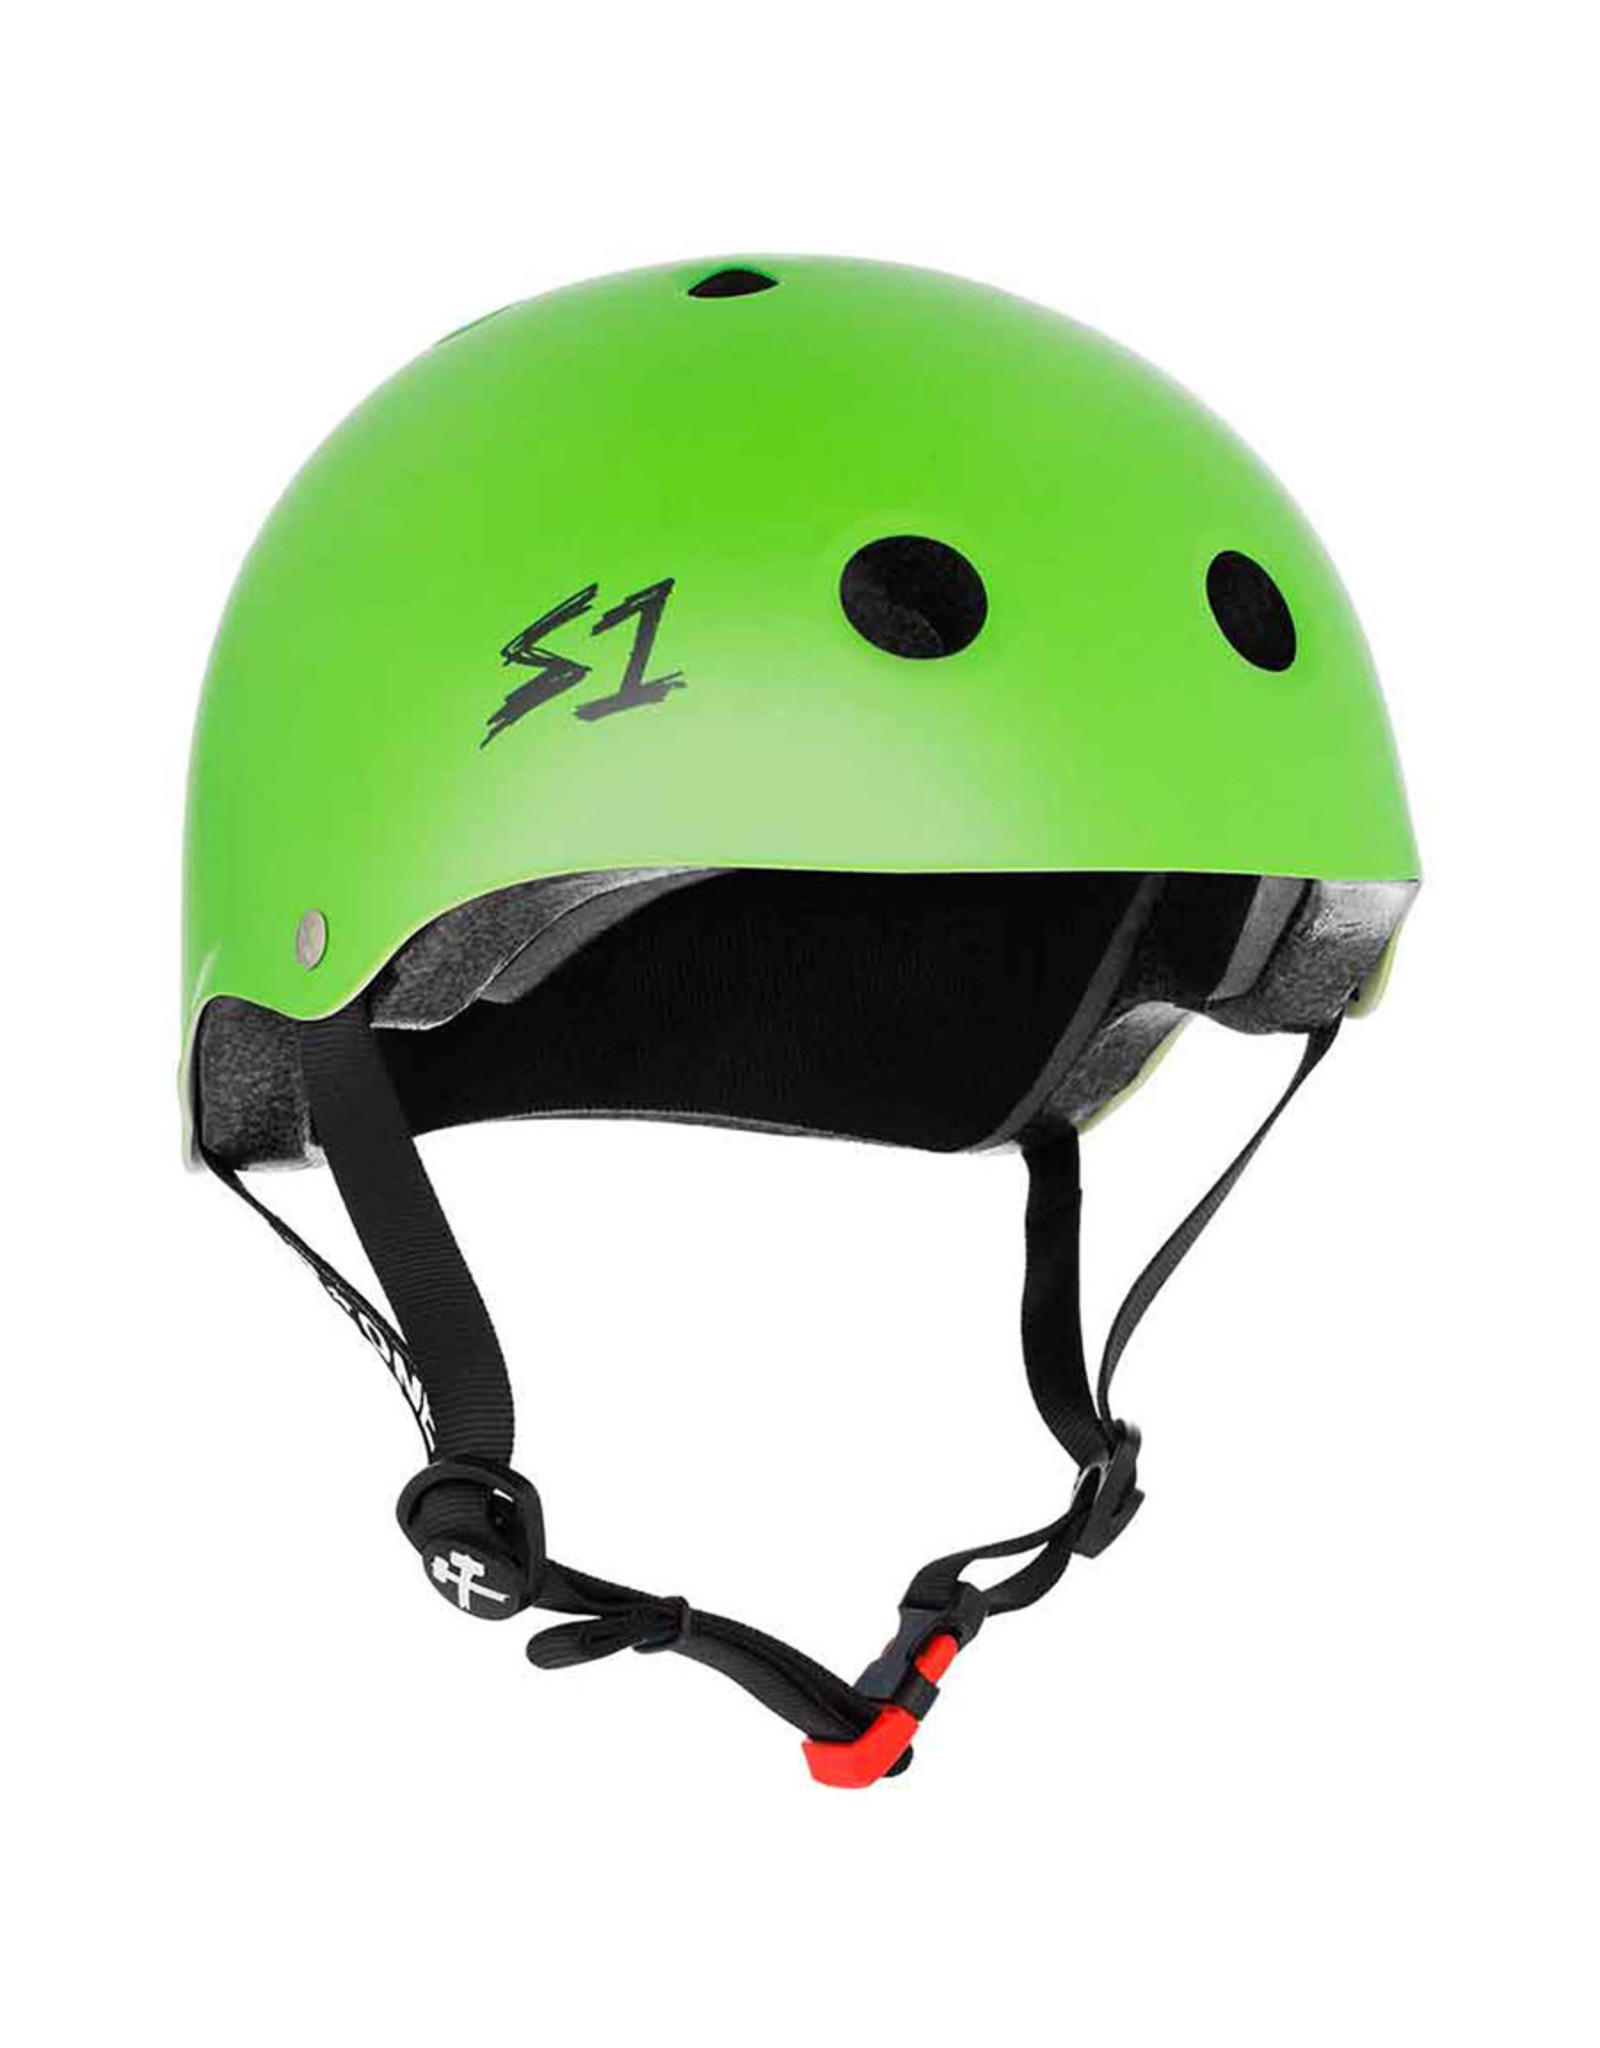 S-One S-One Helmet The Mini (Bright Green Matte/Black Straps)